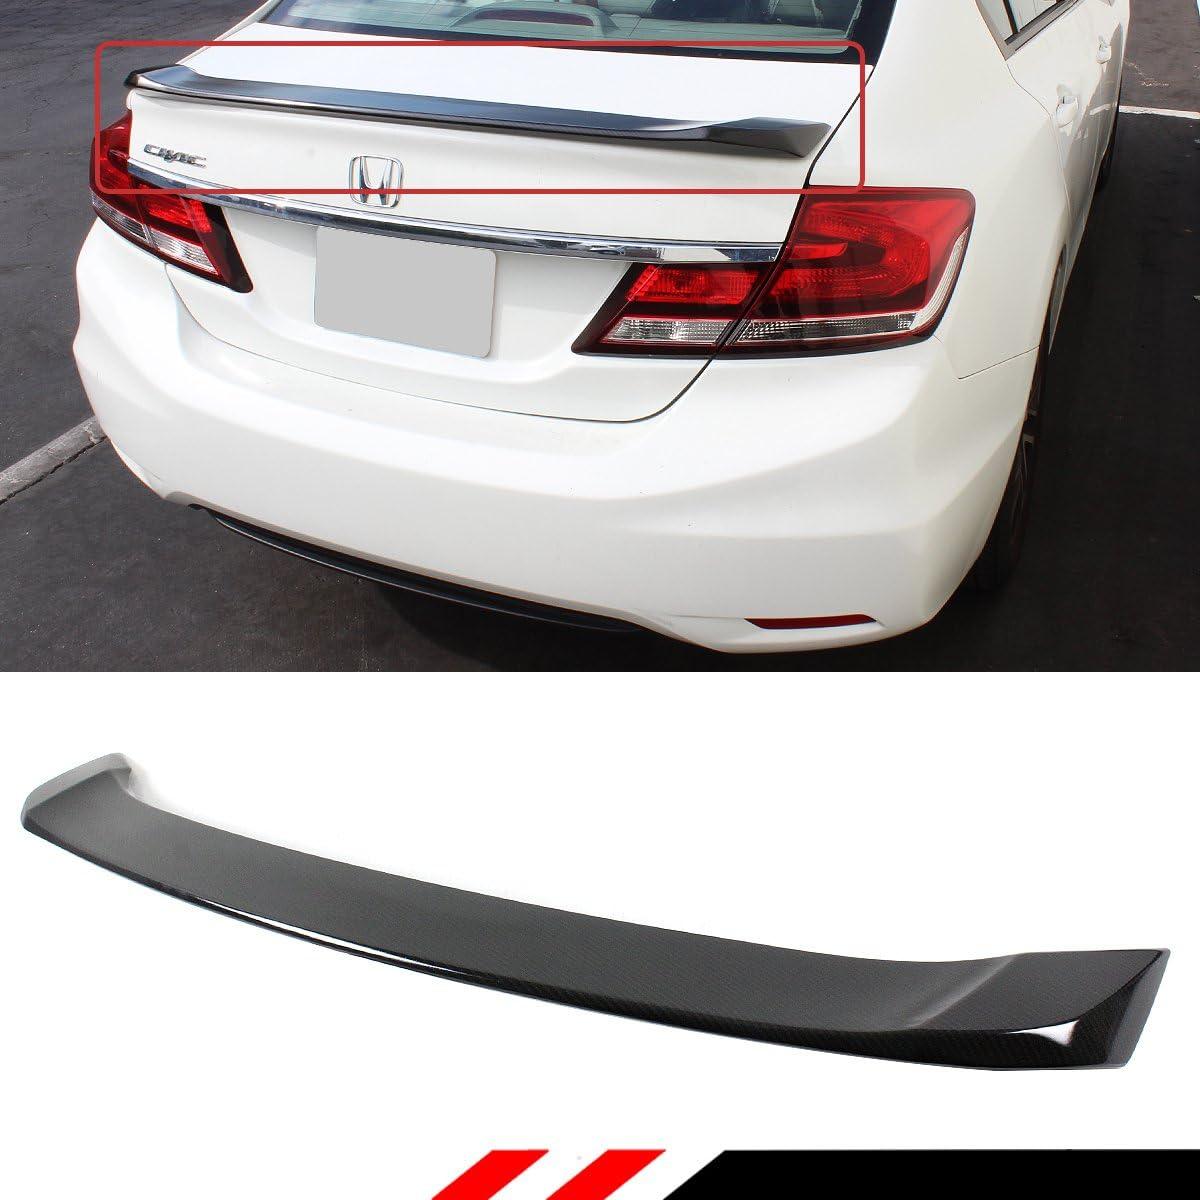 Cuztom Tuning Fits for 2012-2015 9th Gen Honda Civic 4 Door Sedan Si Style Glossy Black Trunk Spoiler Wing W//LED Brake Light